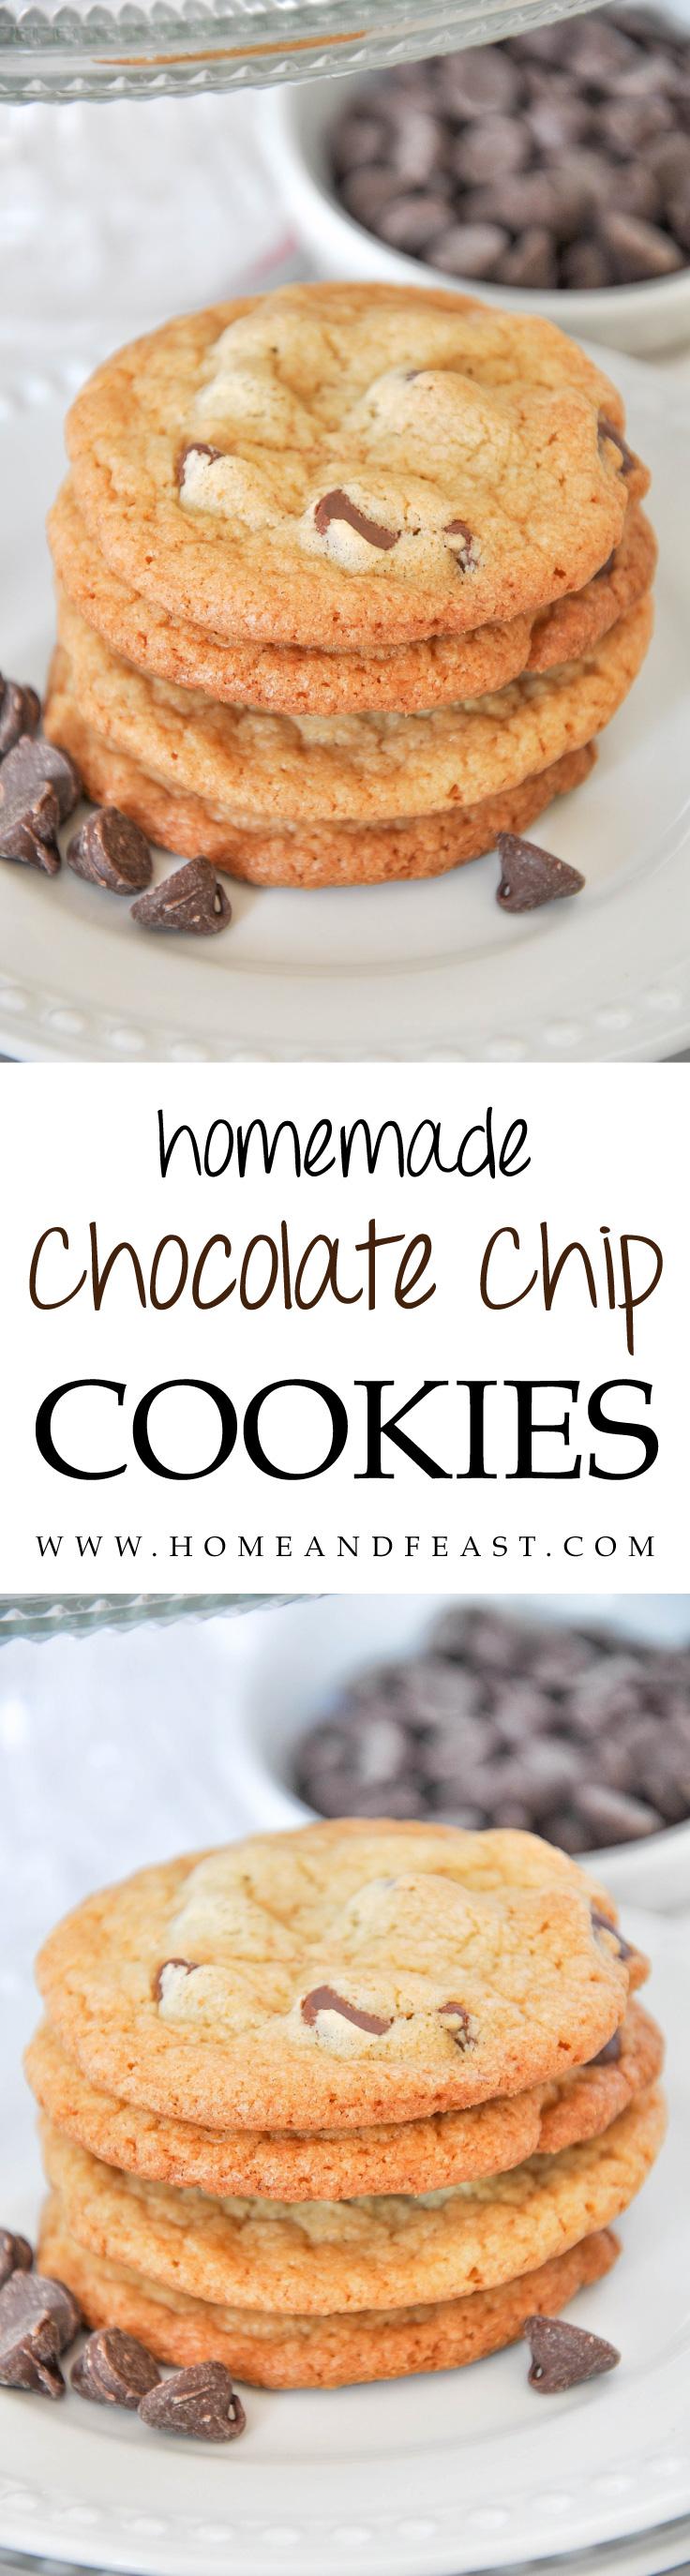 Yummy Homemade Chocolate Chip Cookies